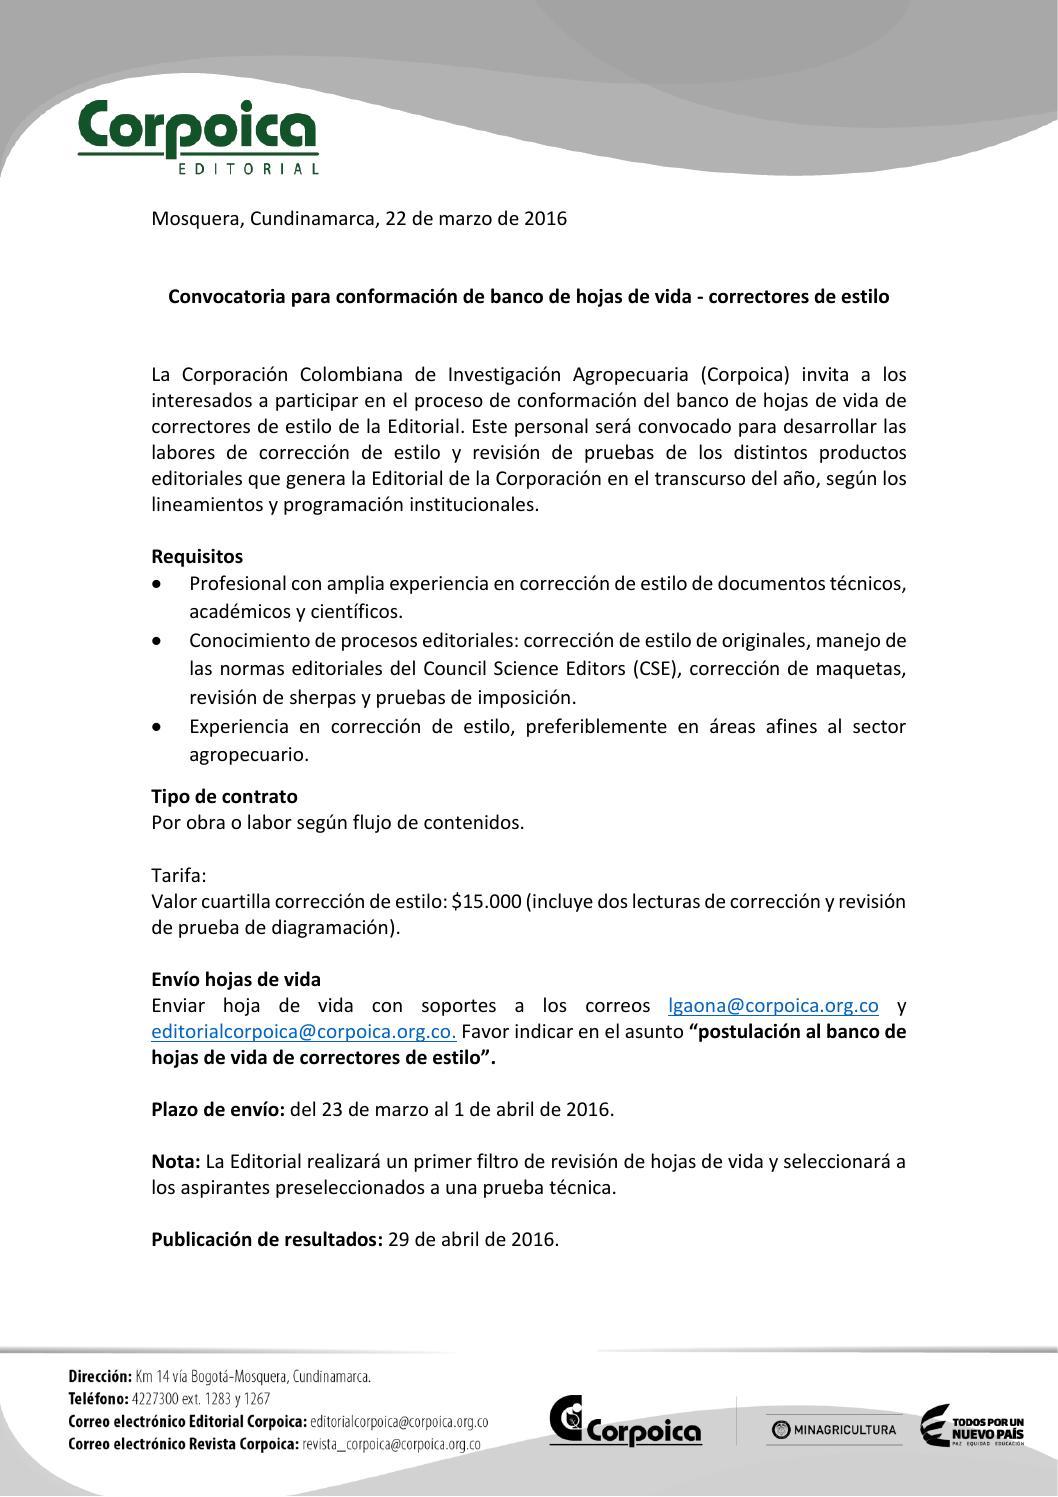 Convocatoria de Corpoica para correctores de estilo. by Correcta - issuu